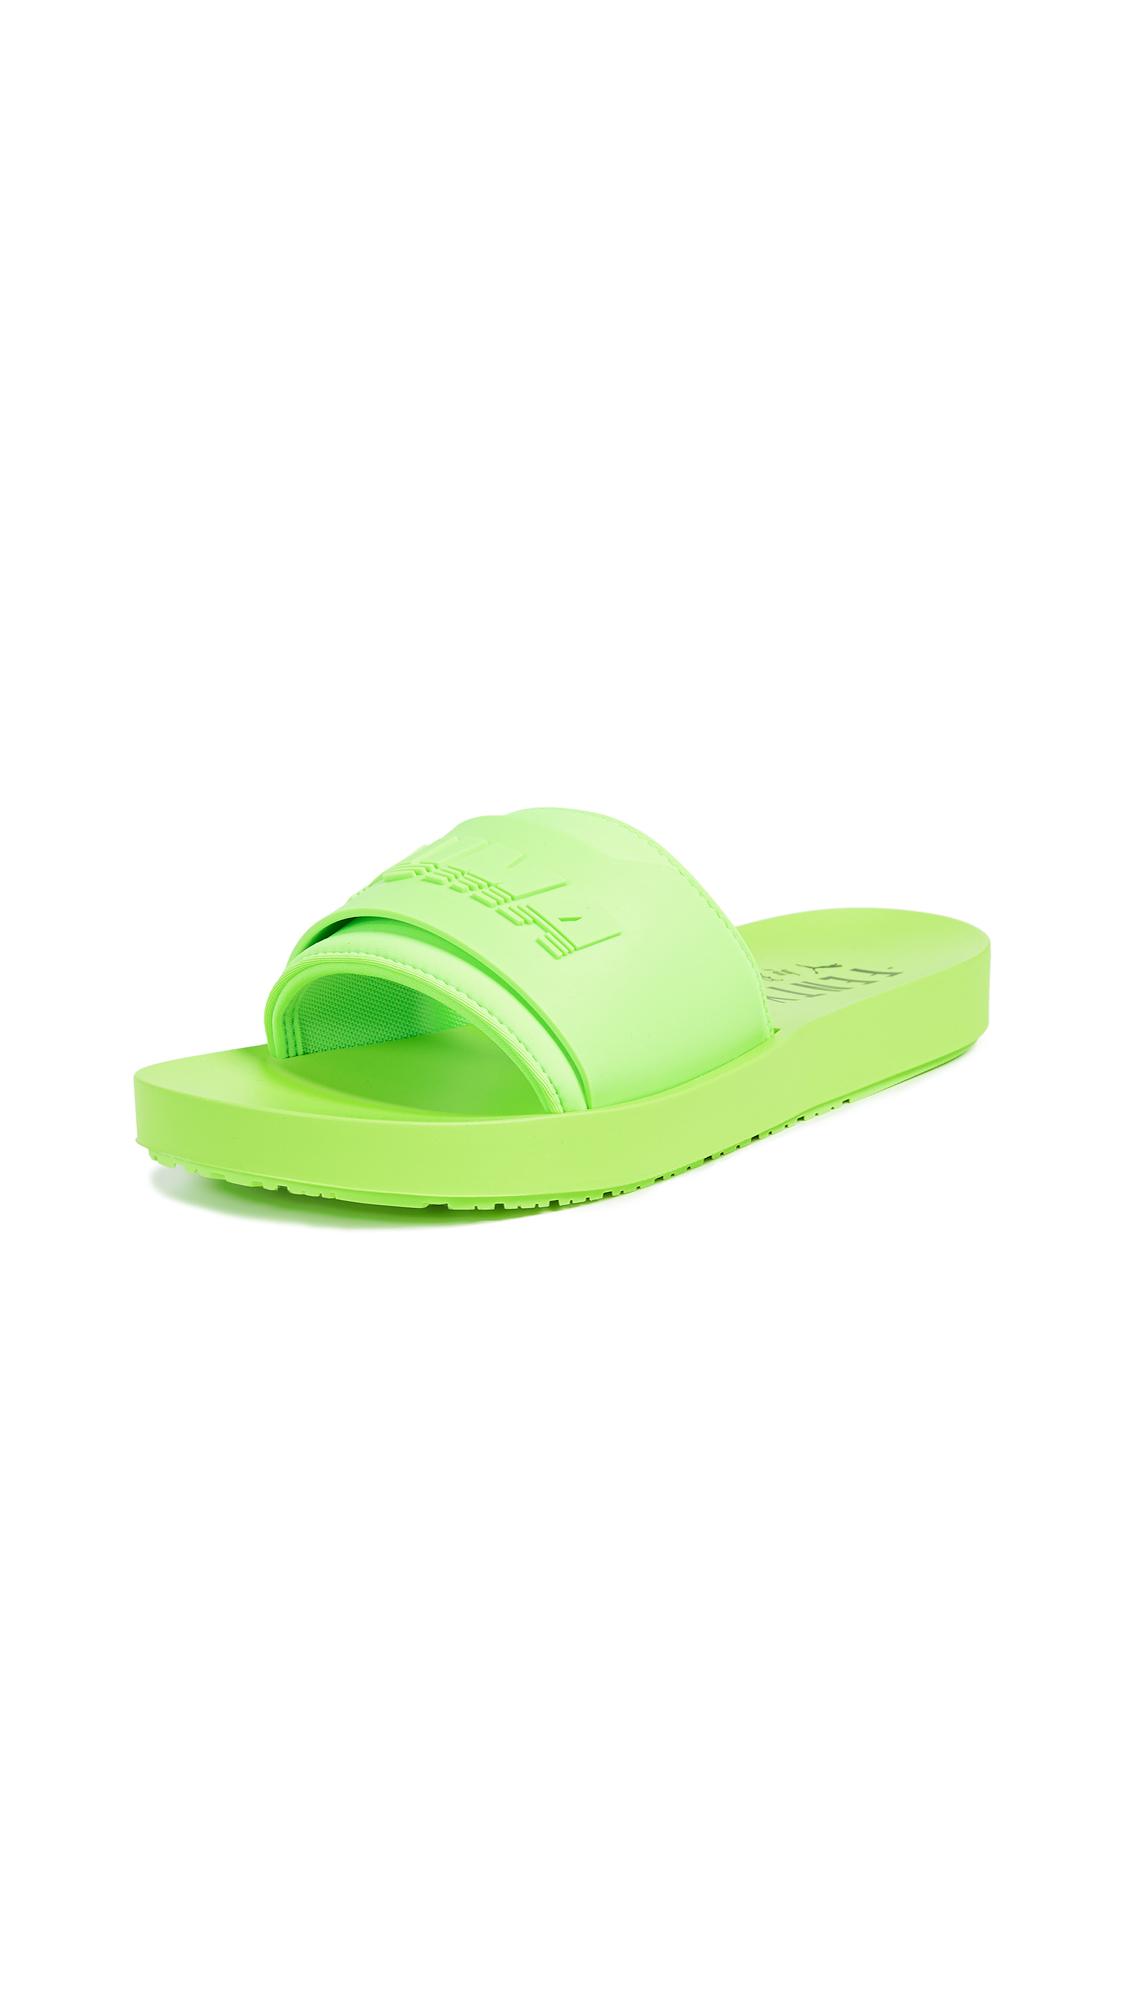 Women'S Fenty X Rihanna Surf Slide Sandals, Green in Green Gecko/Green Gecko